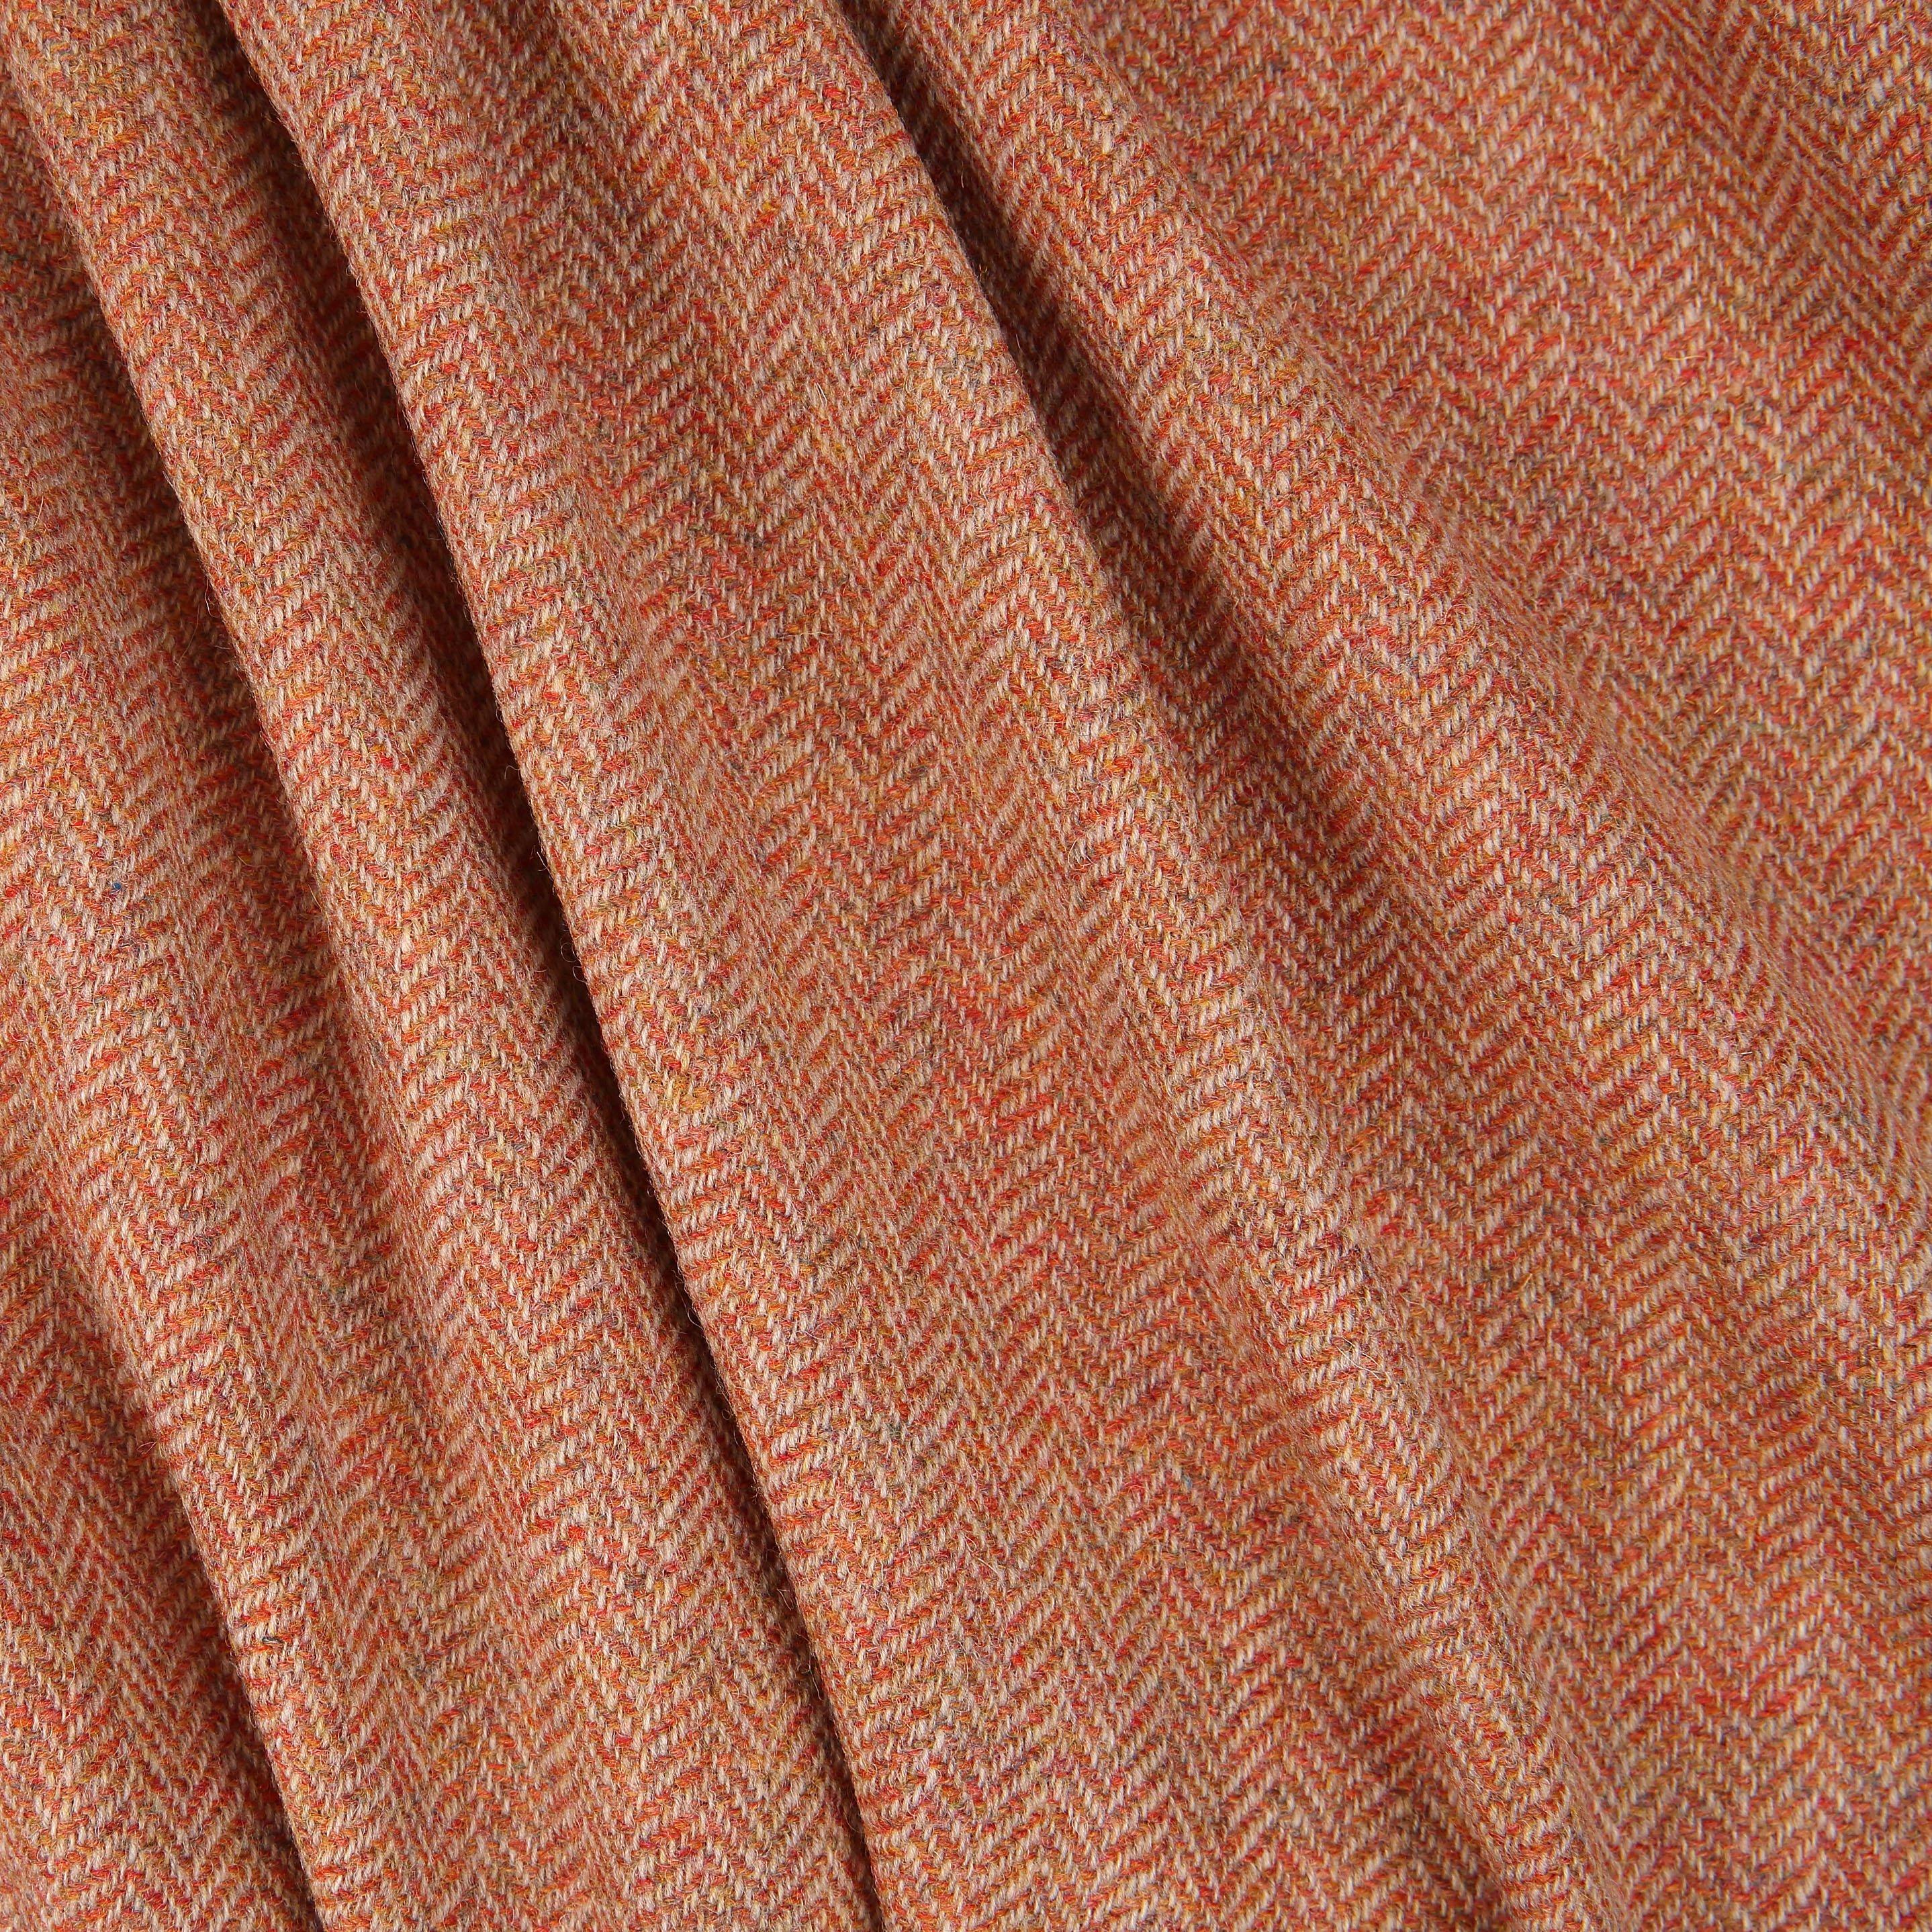 linton-wool-orange-herringbone-bloomsbury-square-fabrics-3013